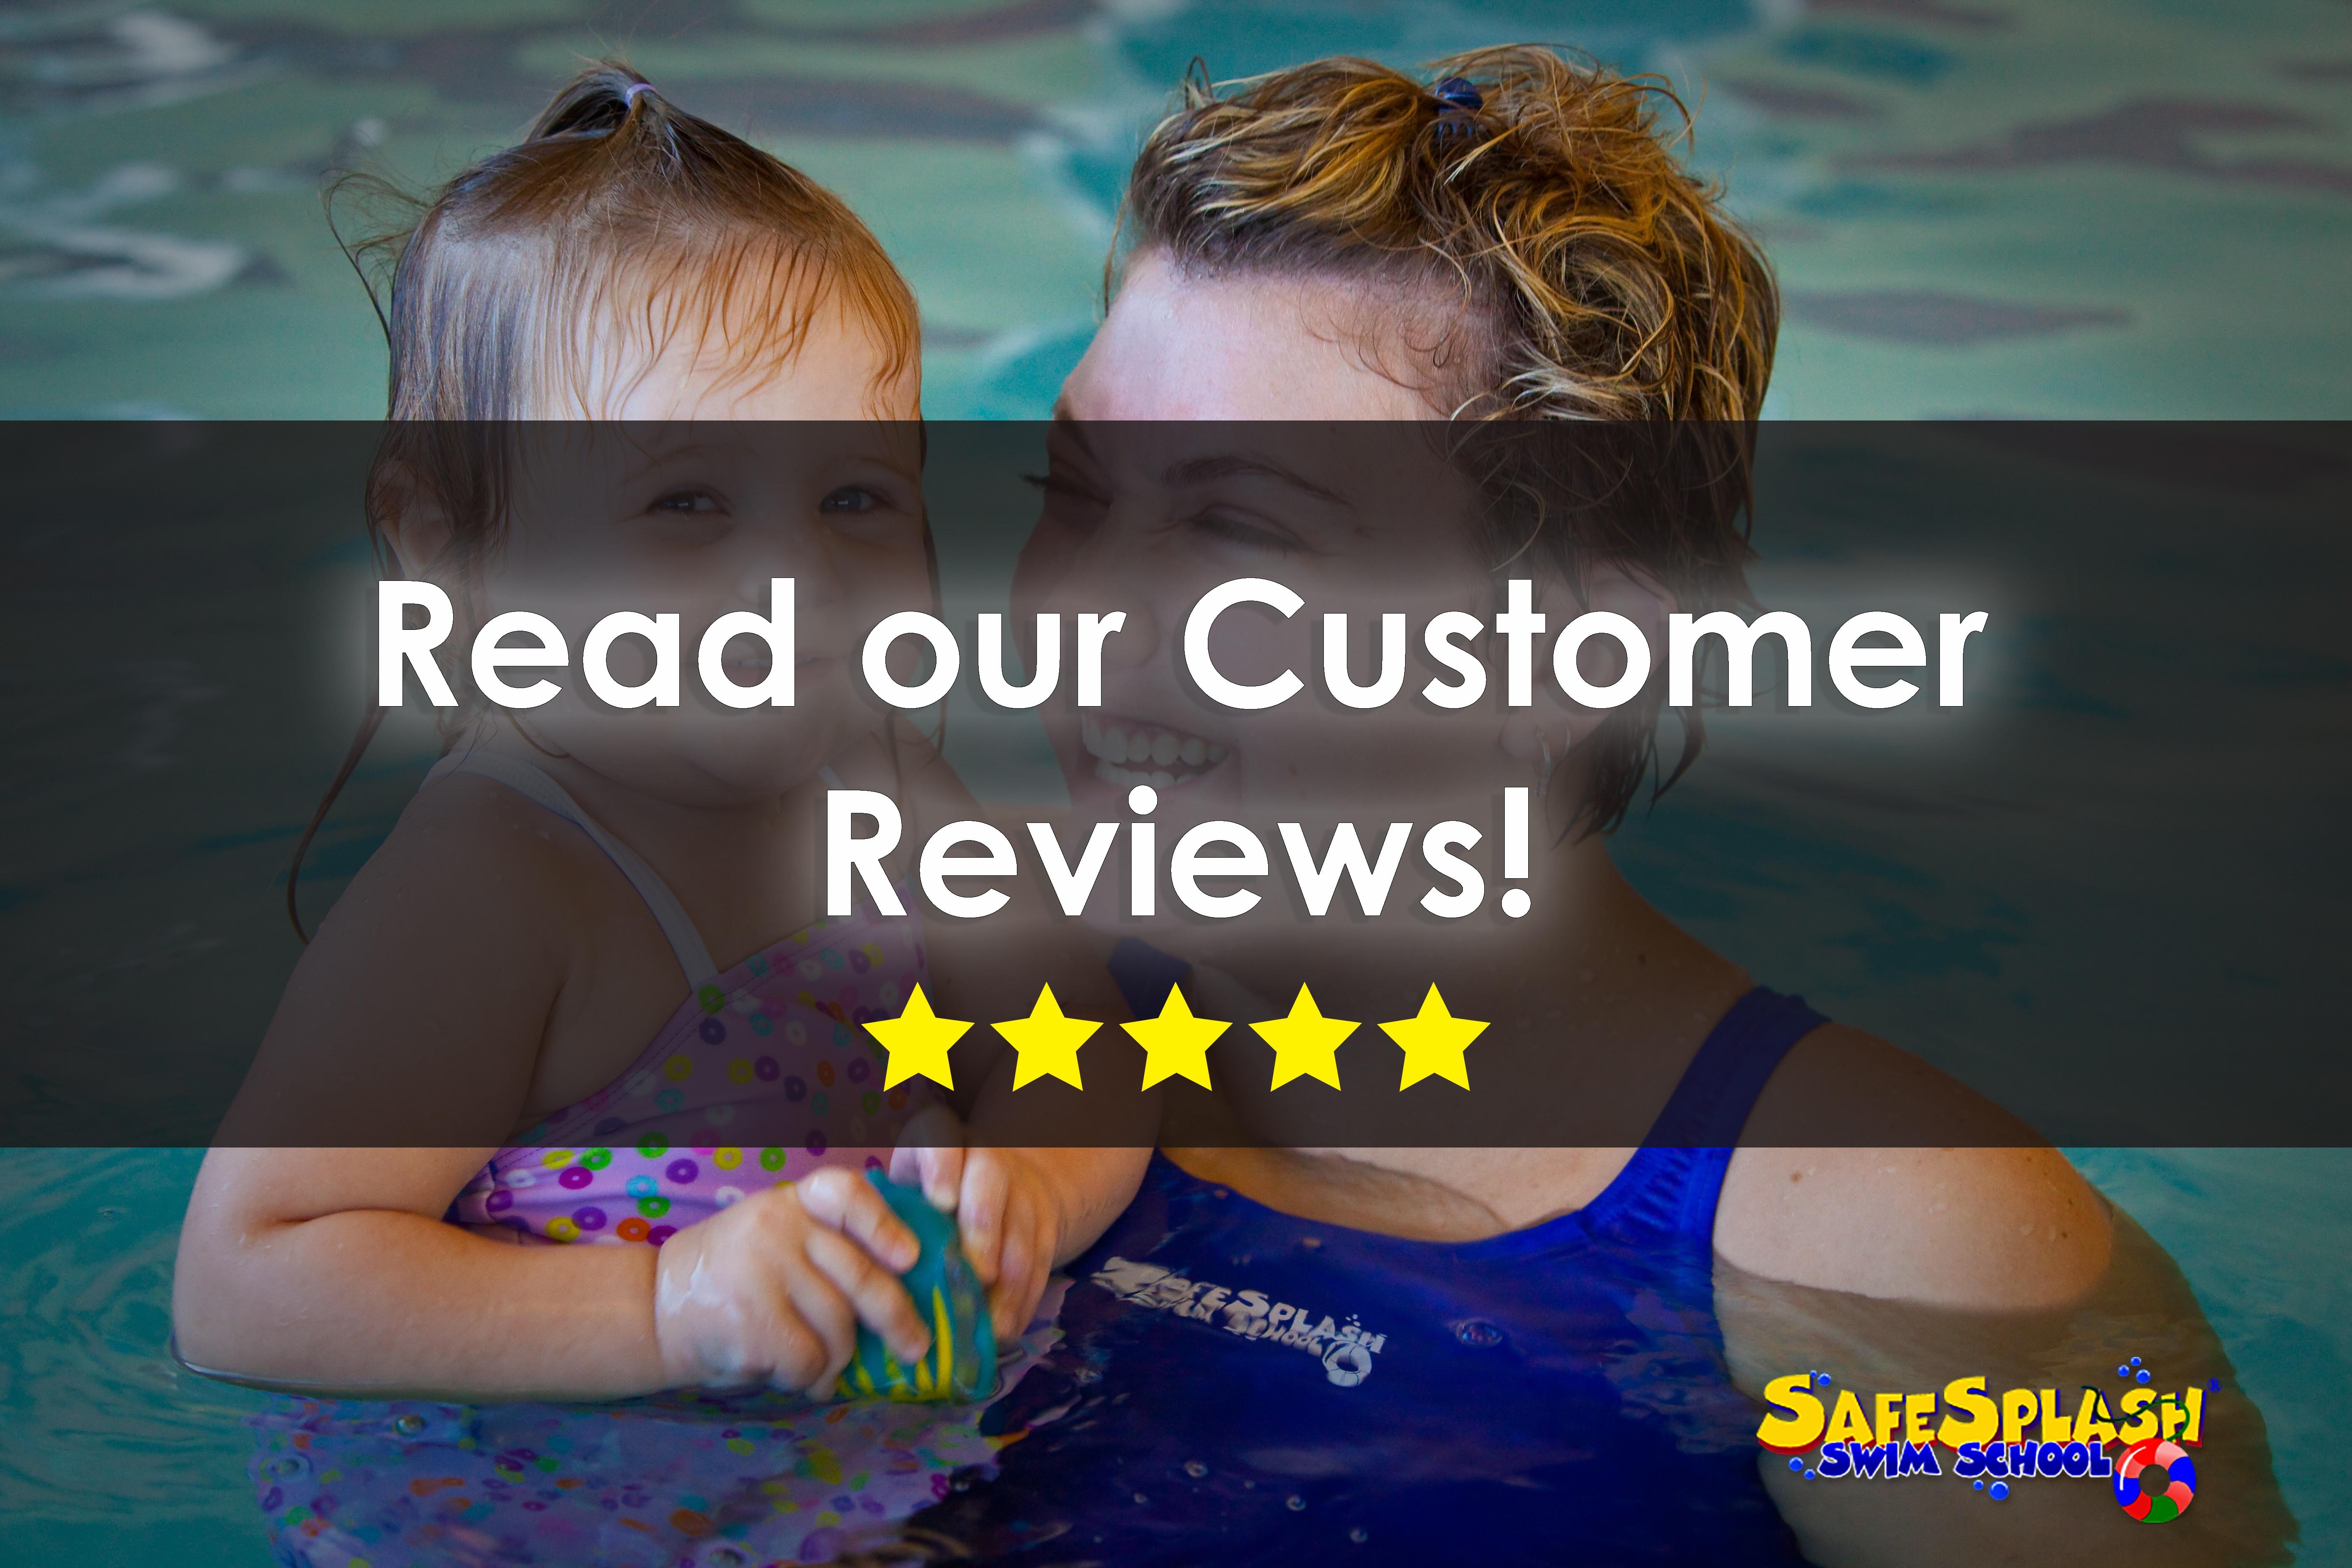 Customer_Review_CTA.jpg